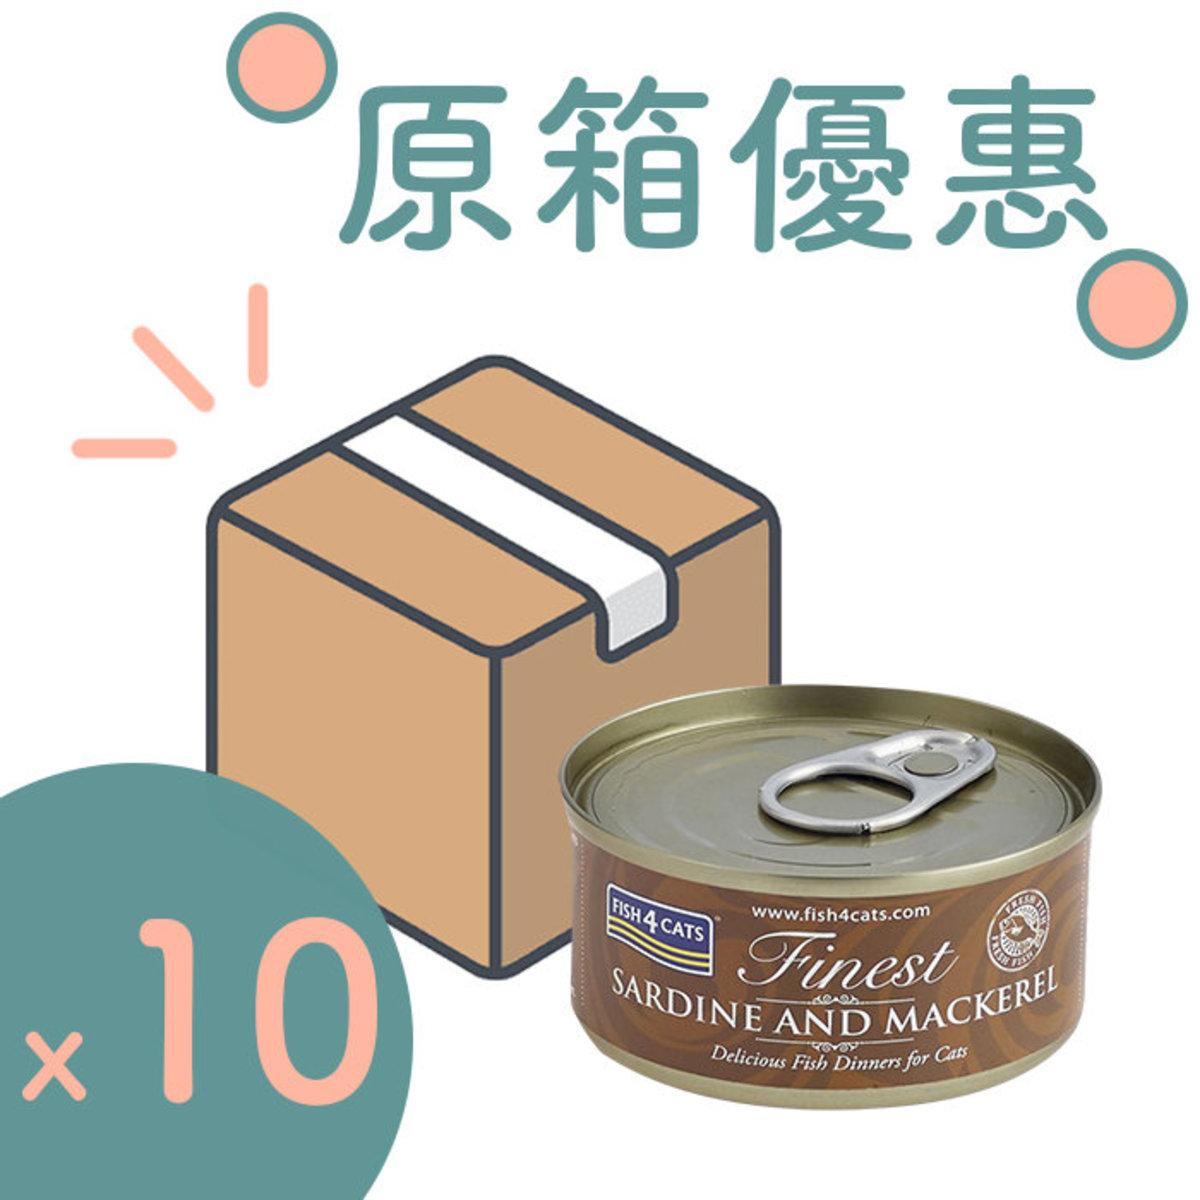 [10PCS BOX] Cat Canned Finest Sardine And Mackerel 70g